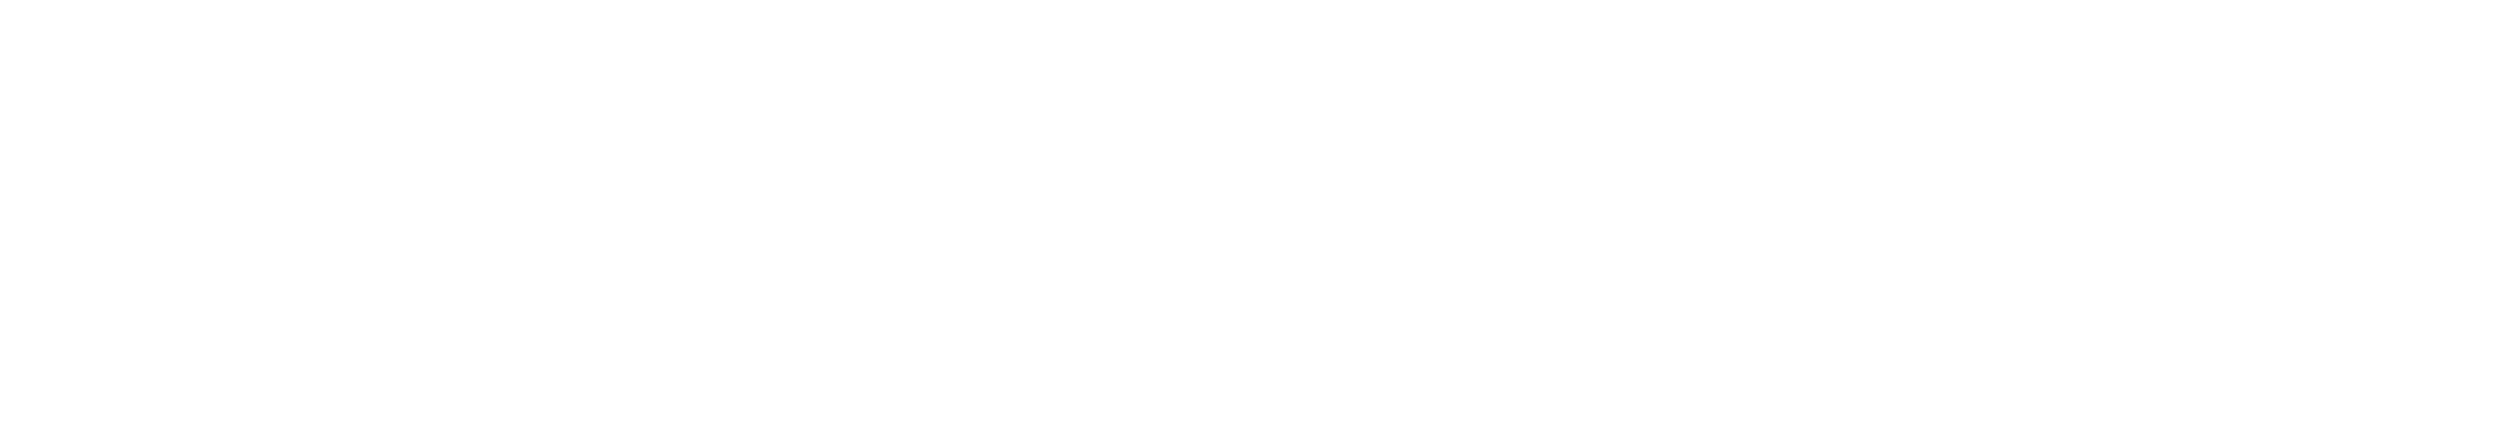 Client logos1-01.png